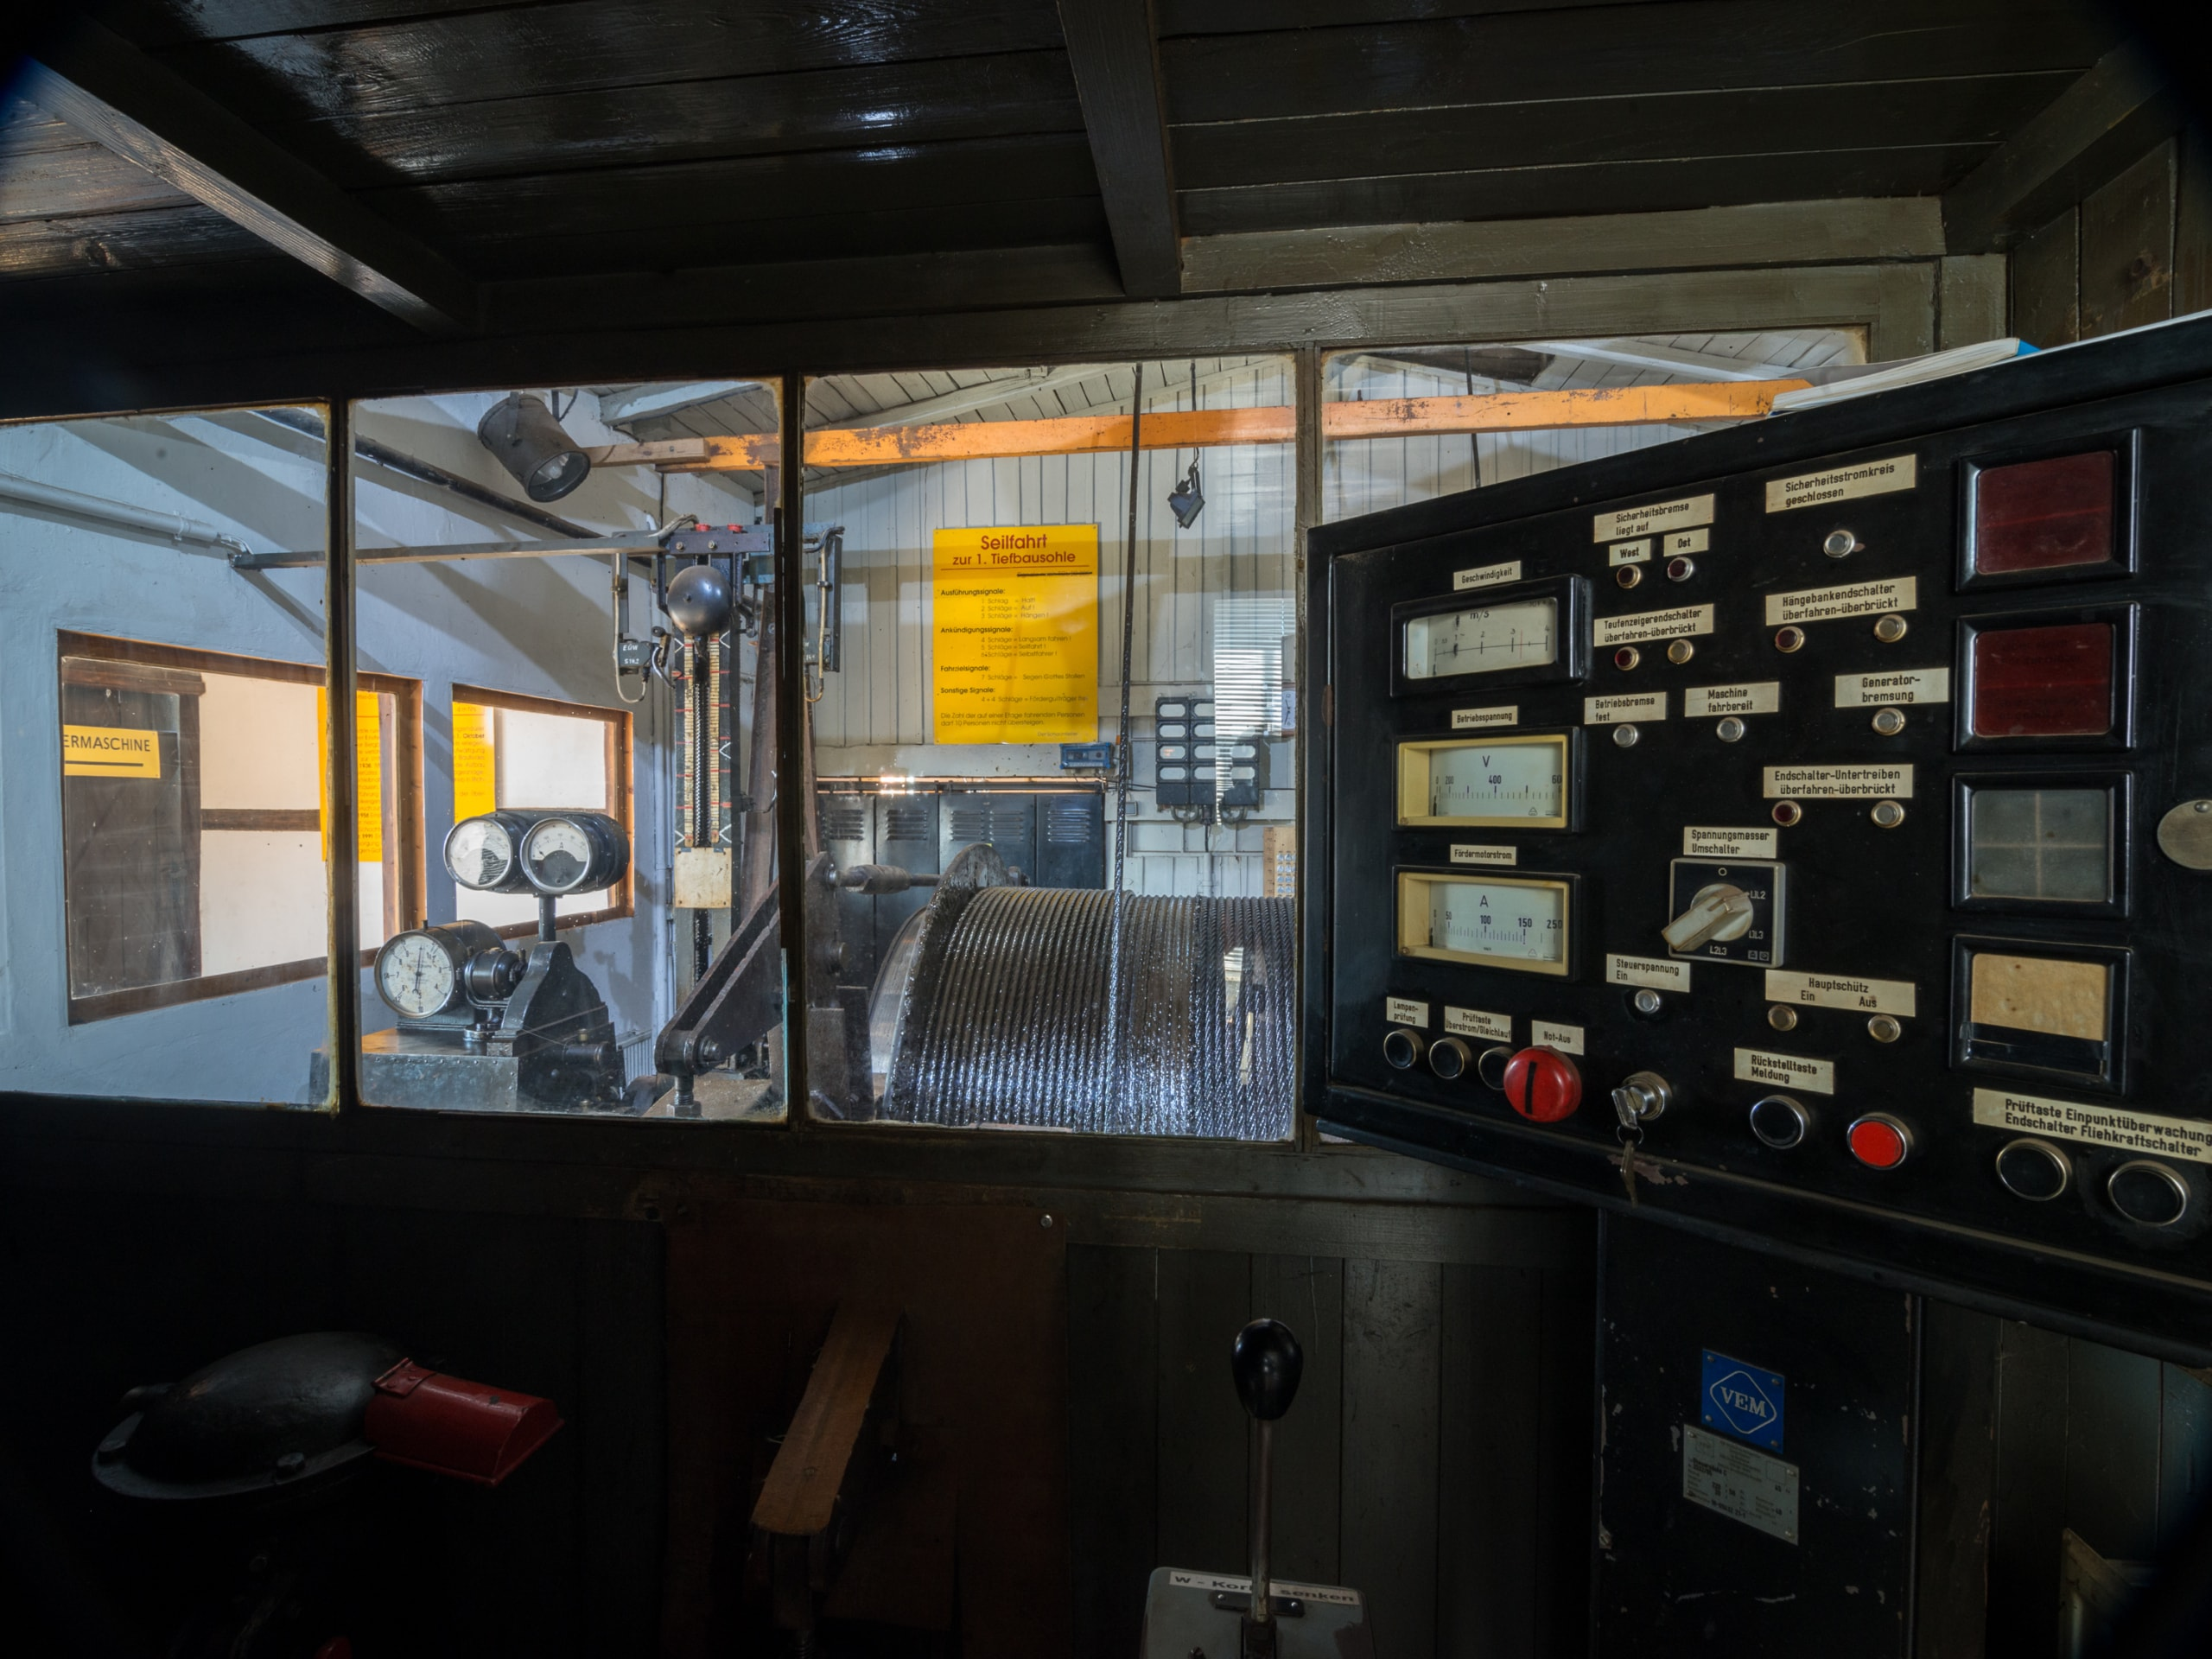 Industriekultur – Röhrigschacht Wettelrode